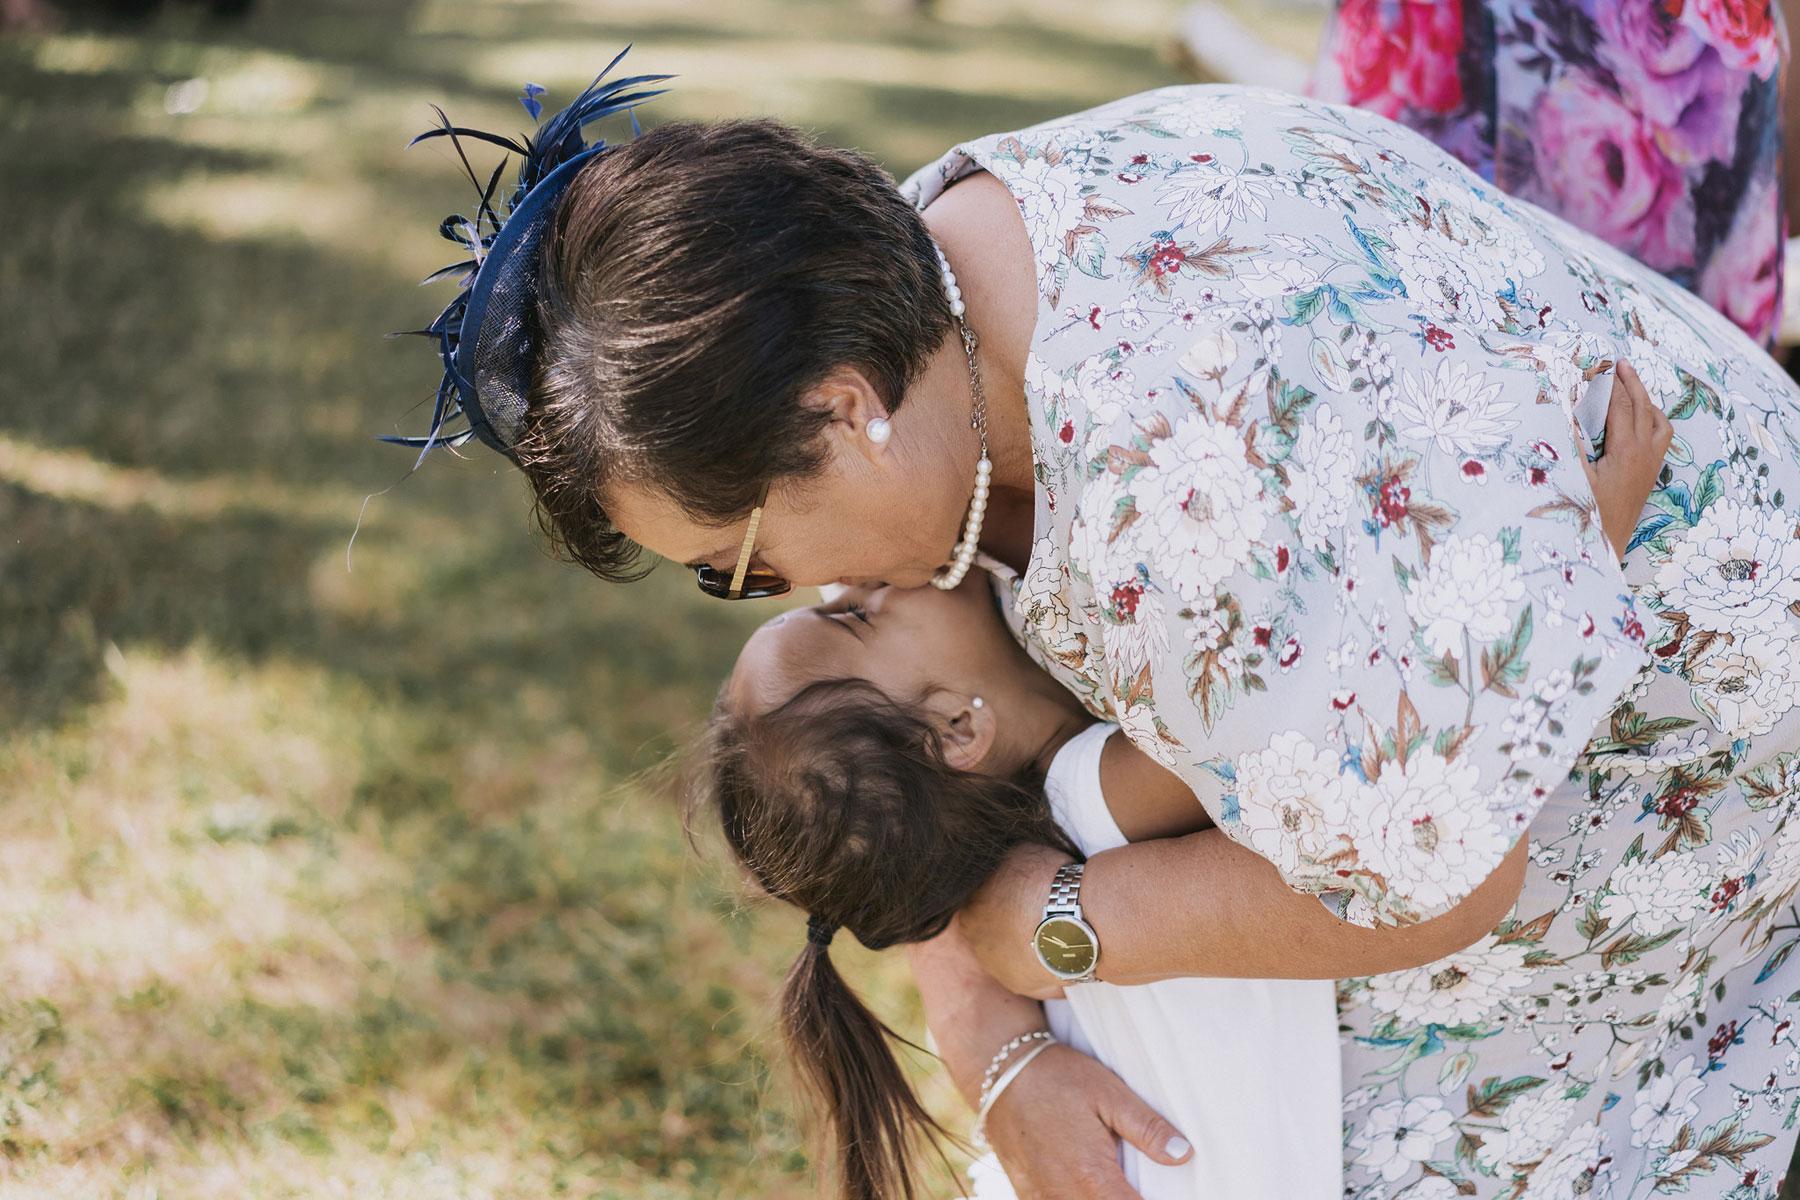 newfound-j-n-orua-beach-house-coromandel-wedding-photographers-383